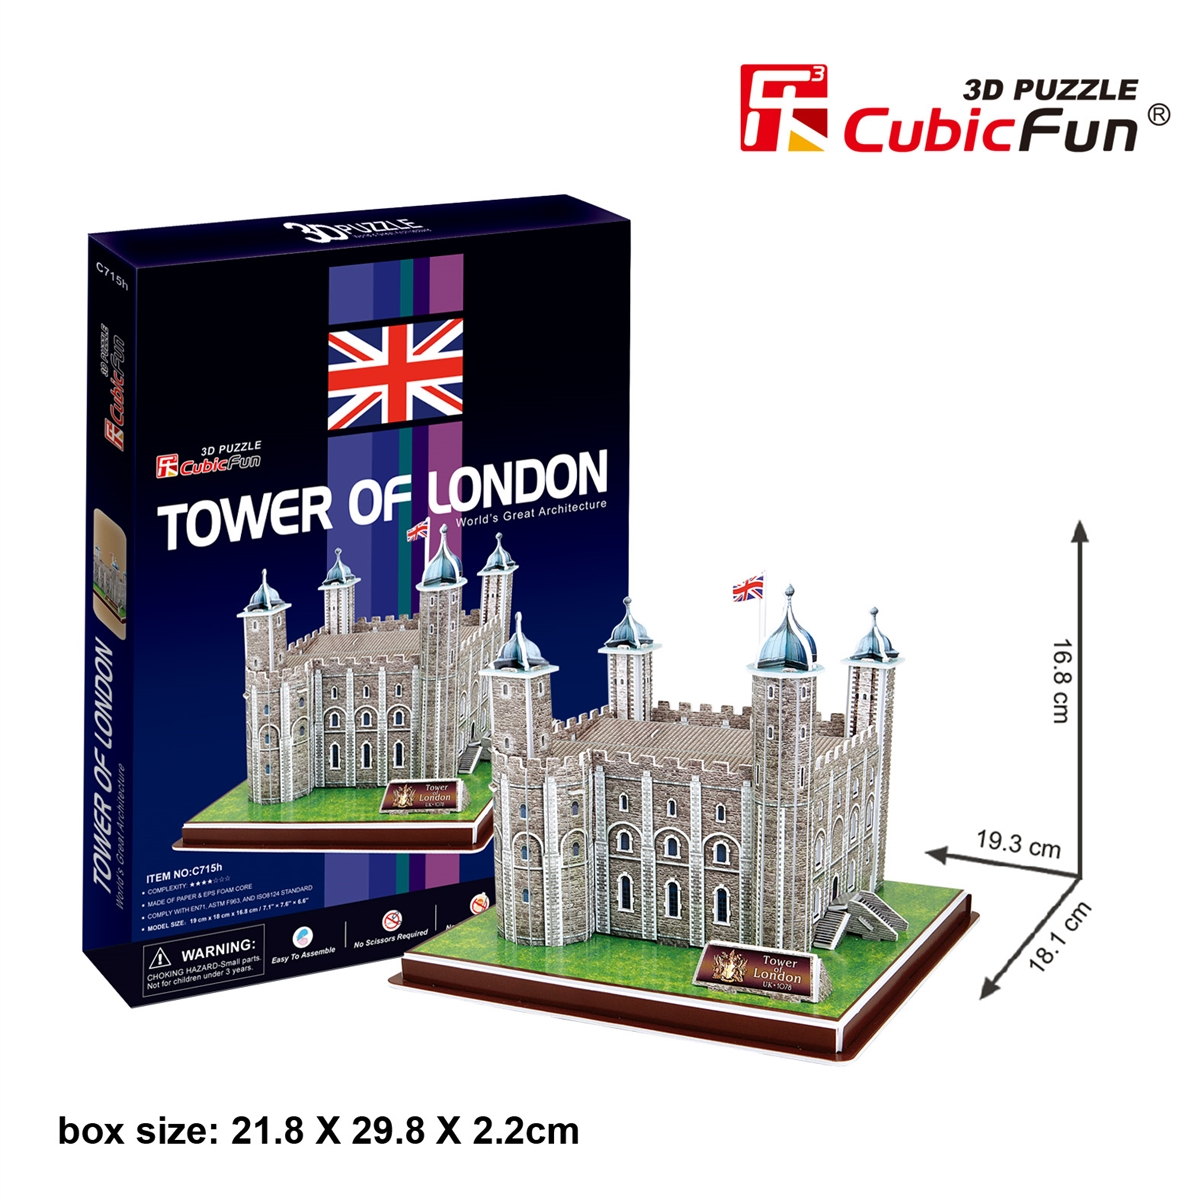 Tower of London หอคอยแห่งลอนดอน Size 19.3*18*16.8 cm Total 40 pcs.